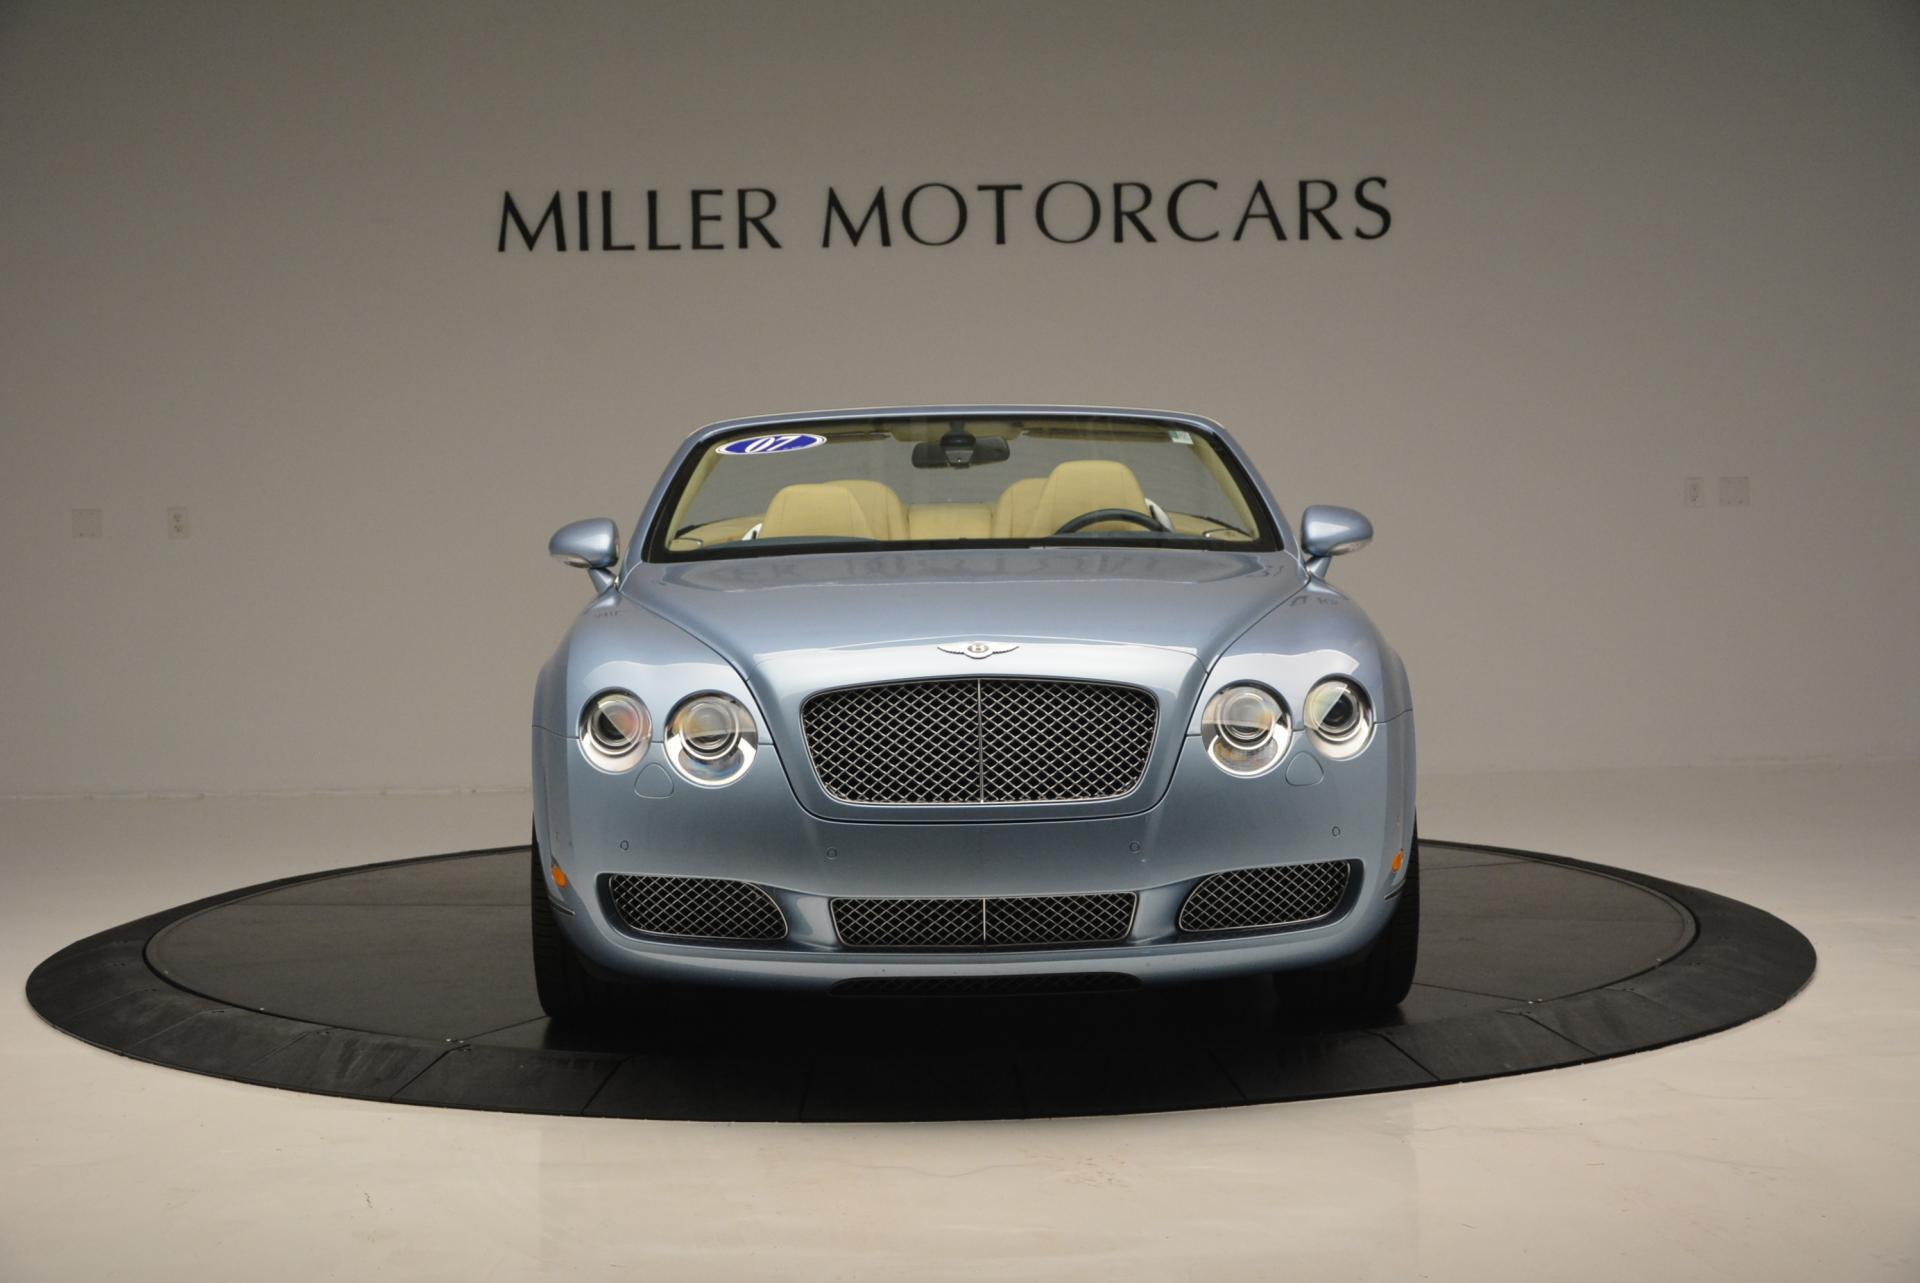 Used 2007 Bentley Continental GTC  For Sale In Westport, CT 495_p11